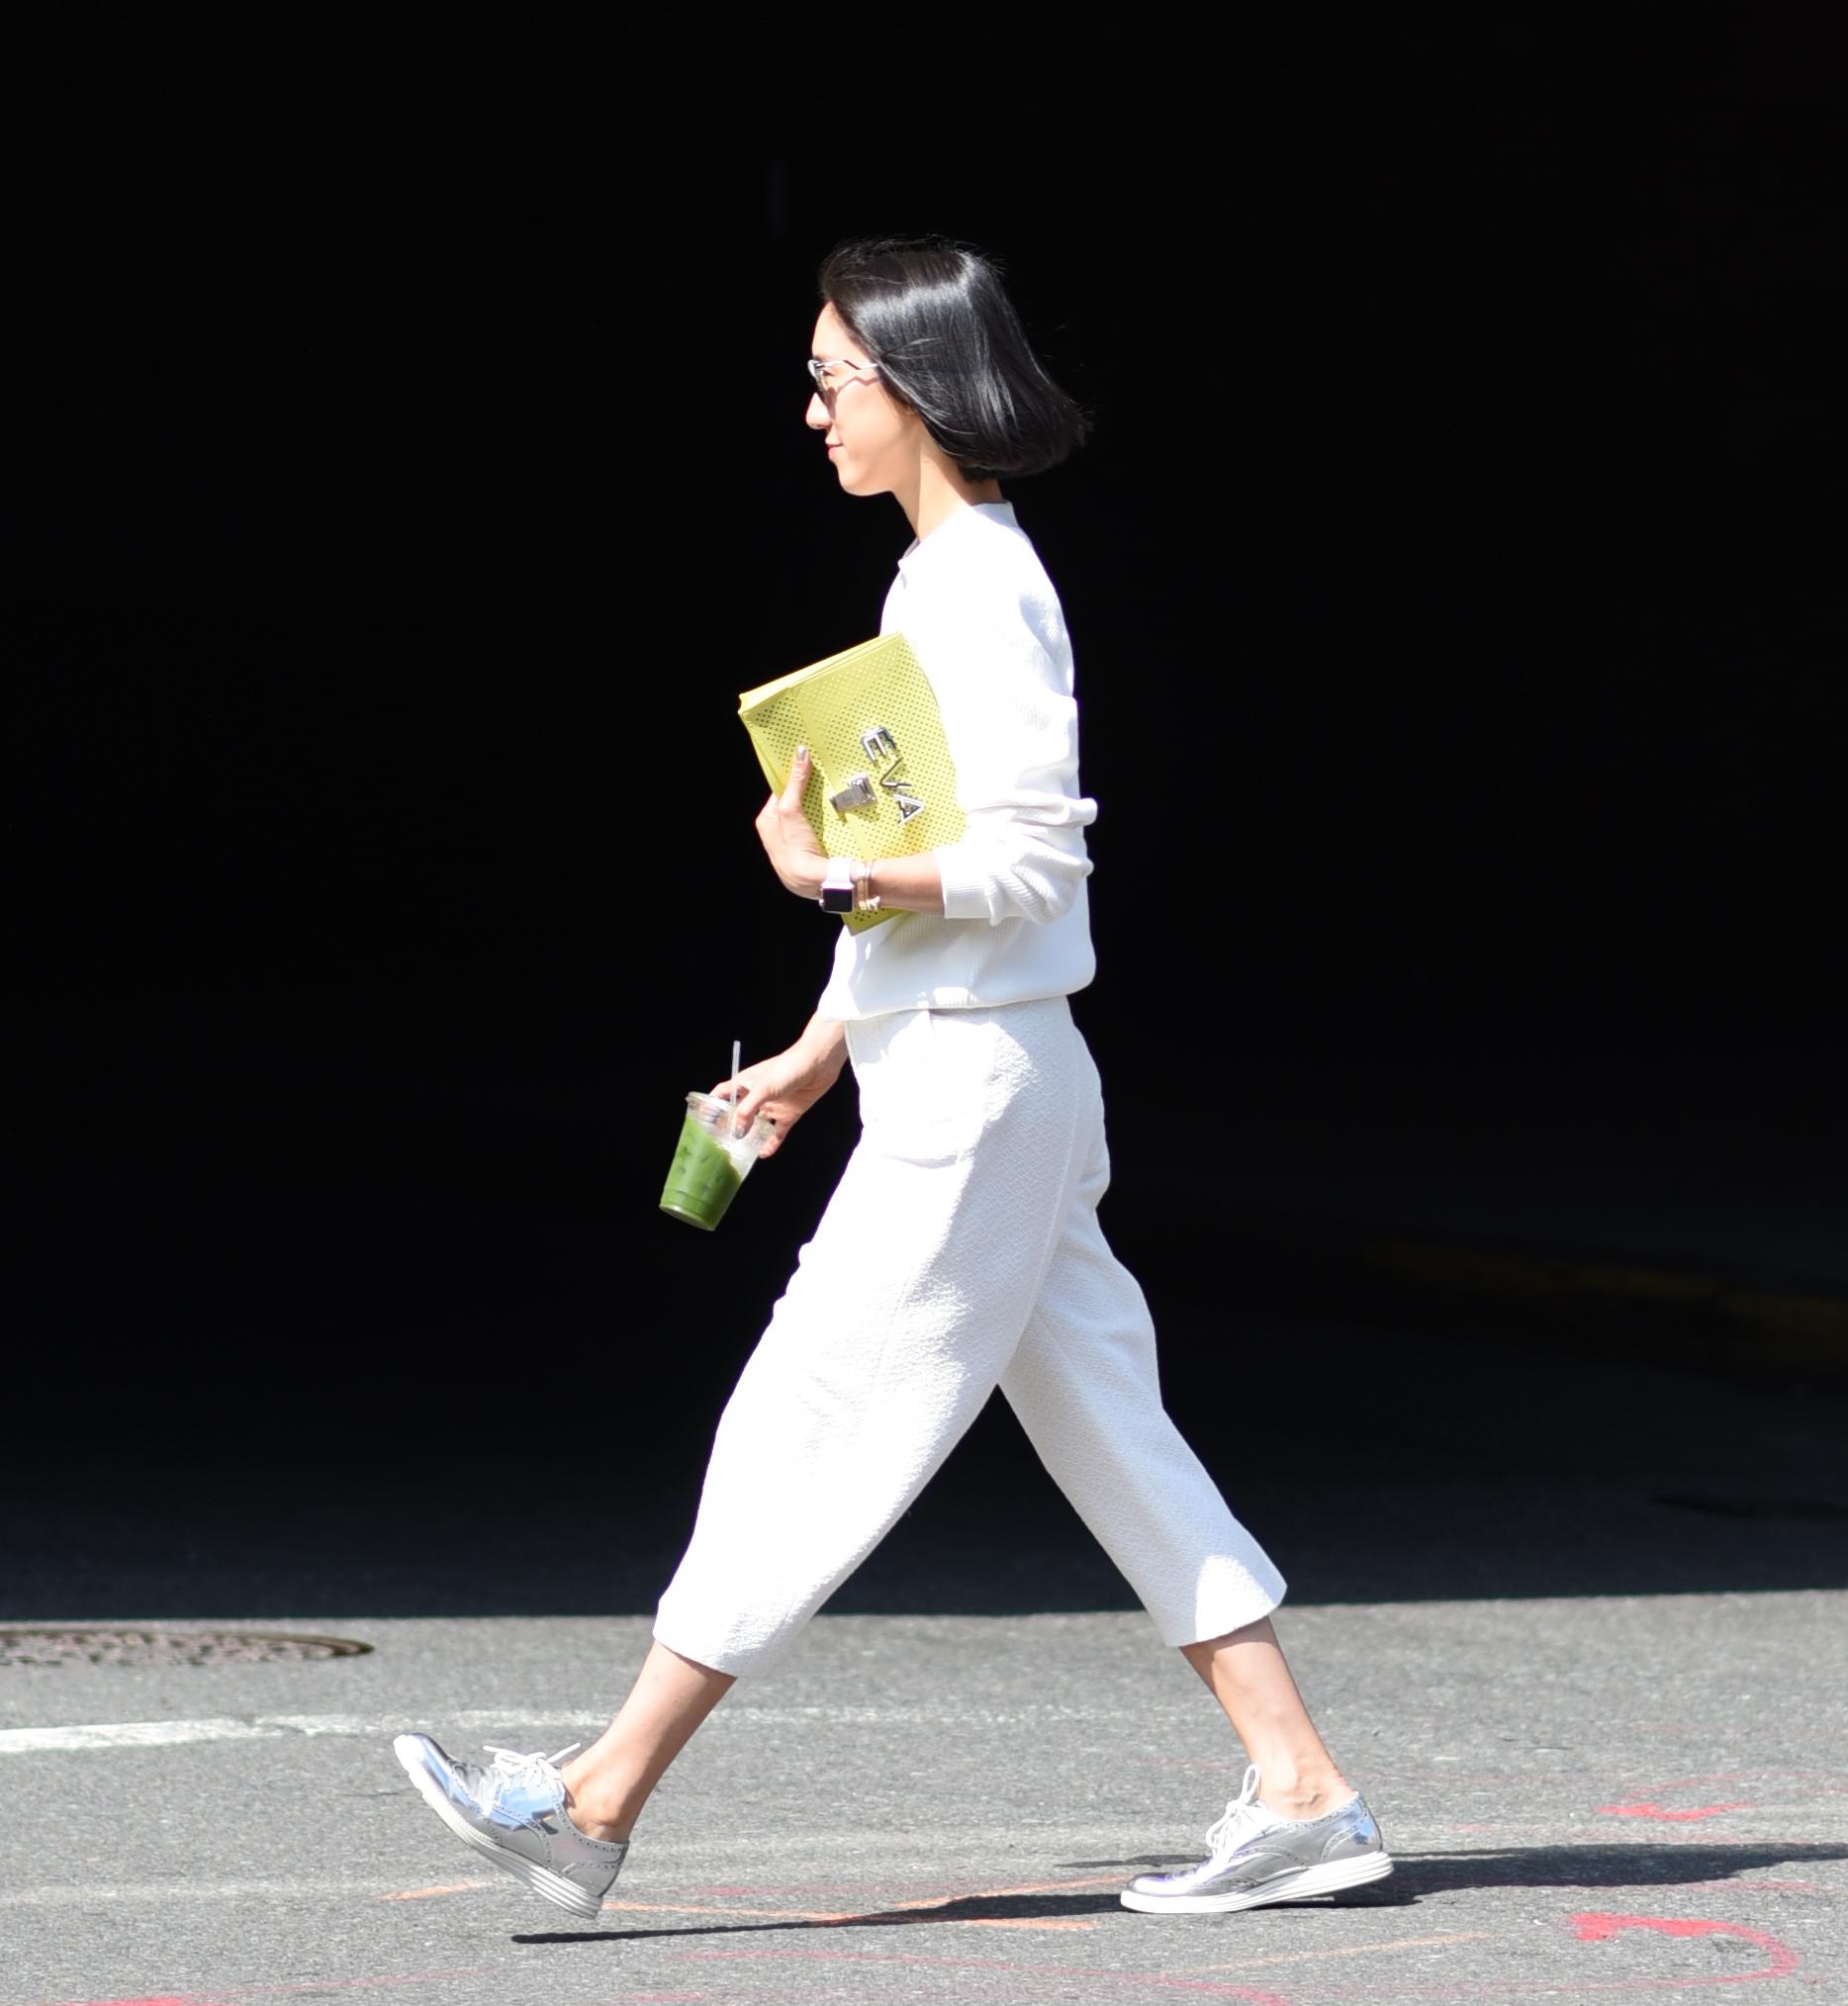 Eva Chen, Head of Fashion Partnerships at Instagram